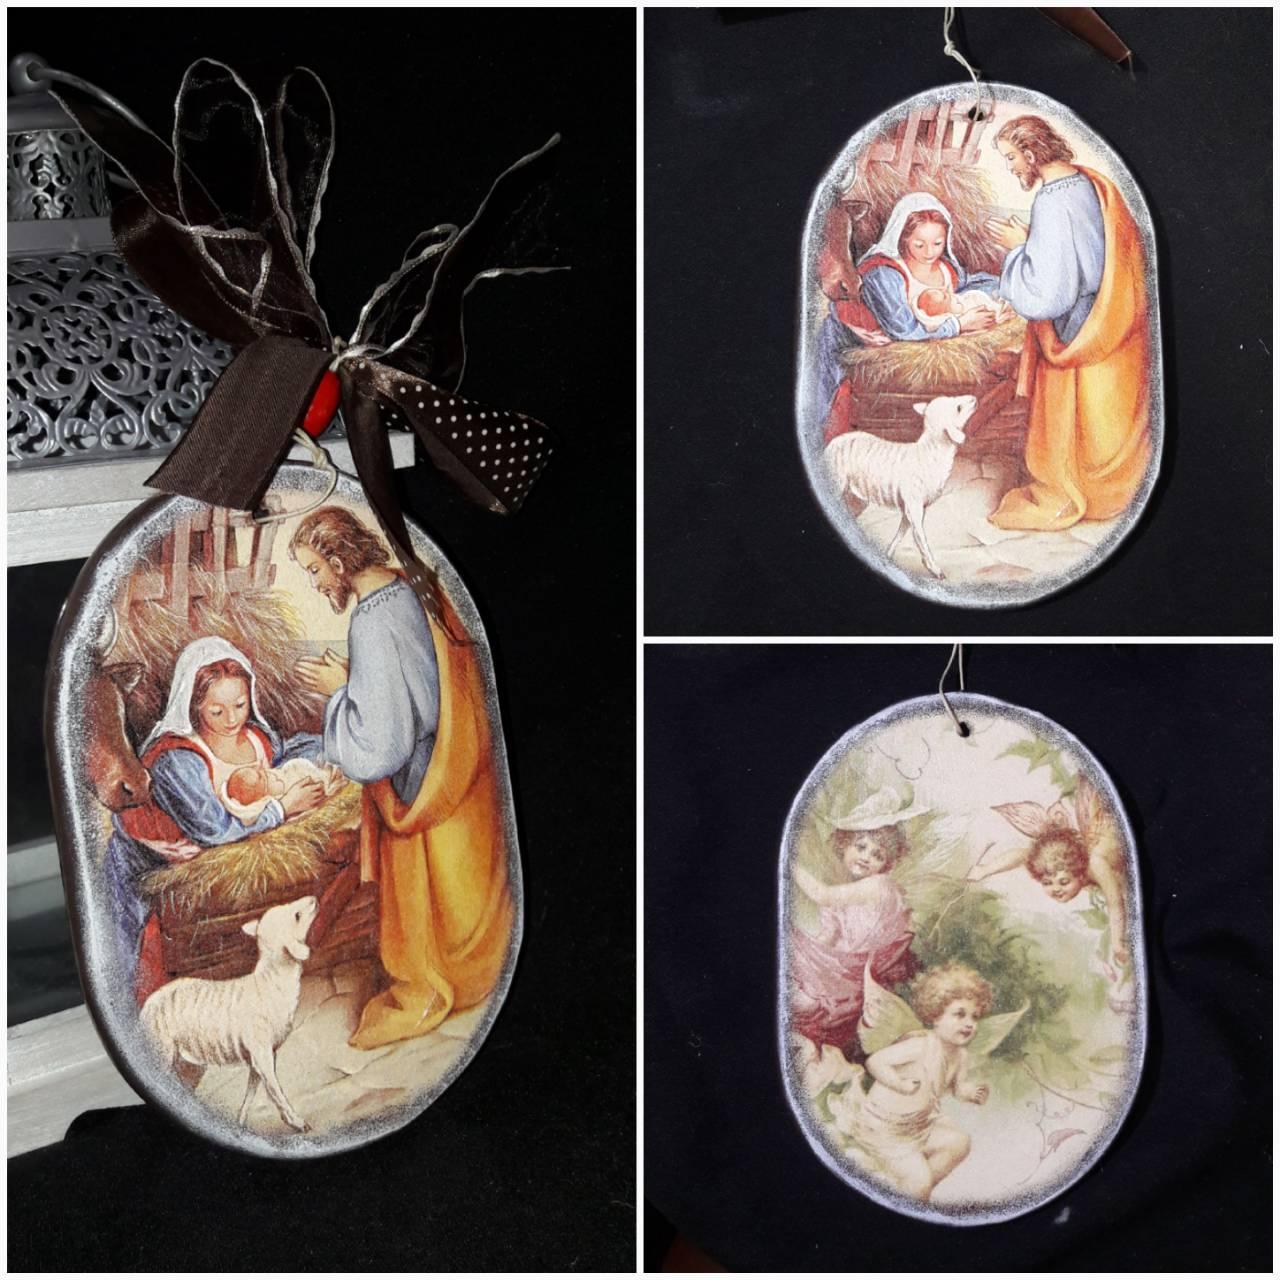 Вертеп рождественский из дерева, двусторонний, ручная работа, 19х13 см., 145/115 (цена за 1 шт. + 40 гр.)